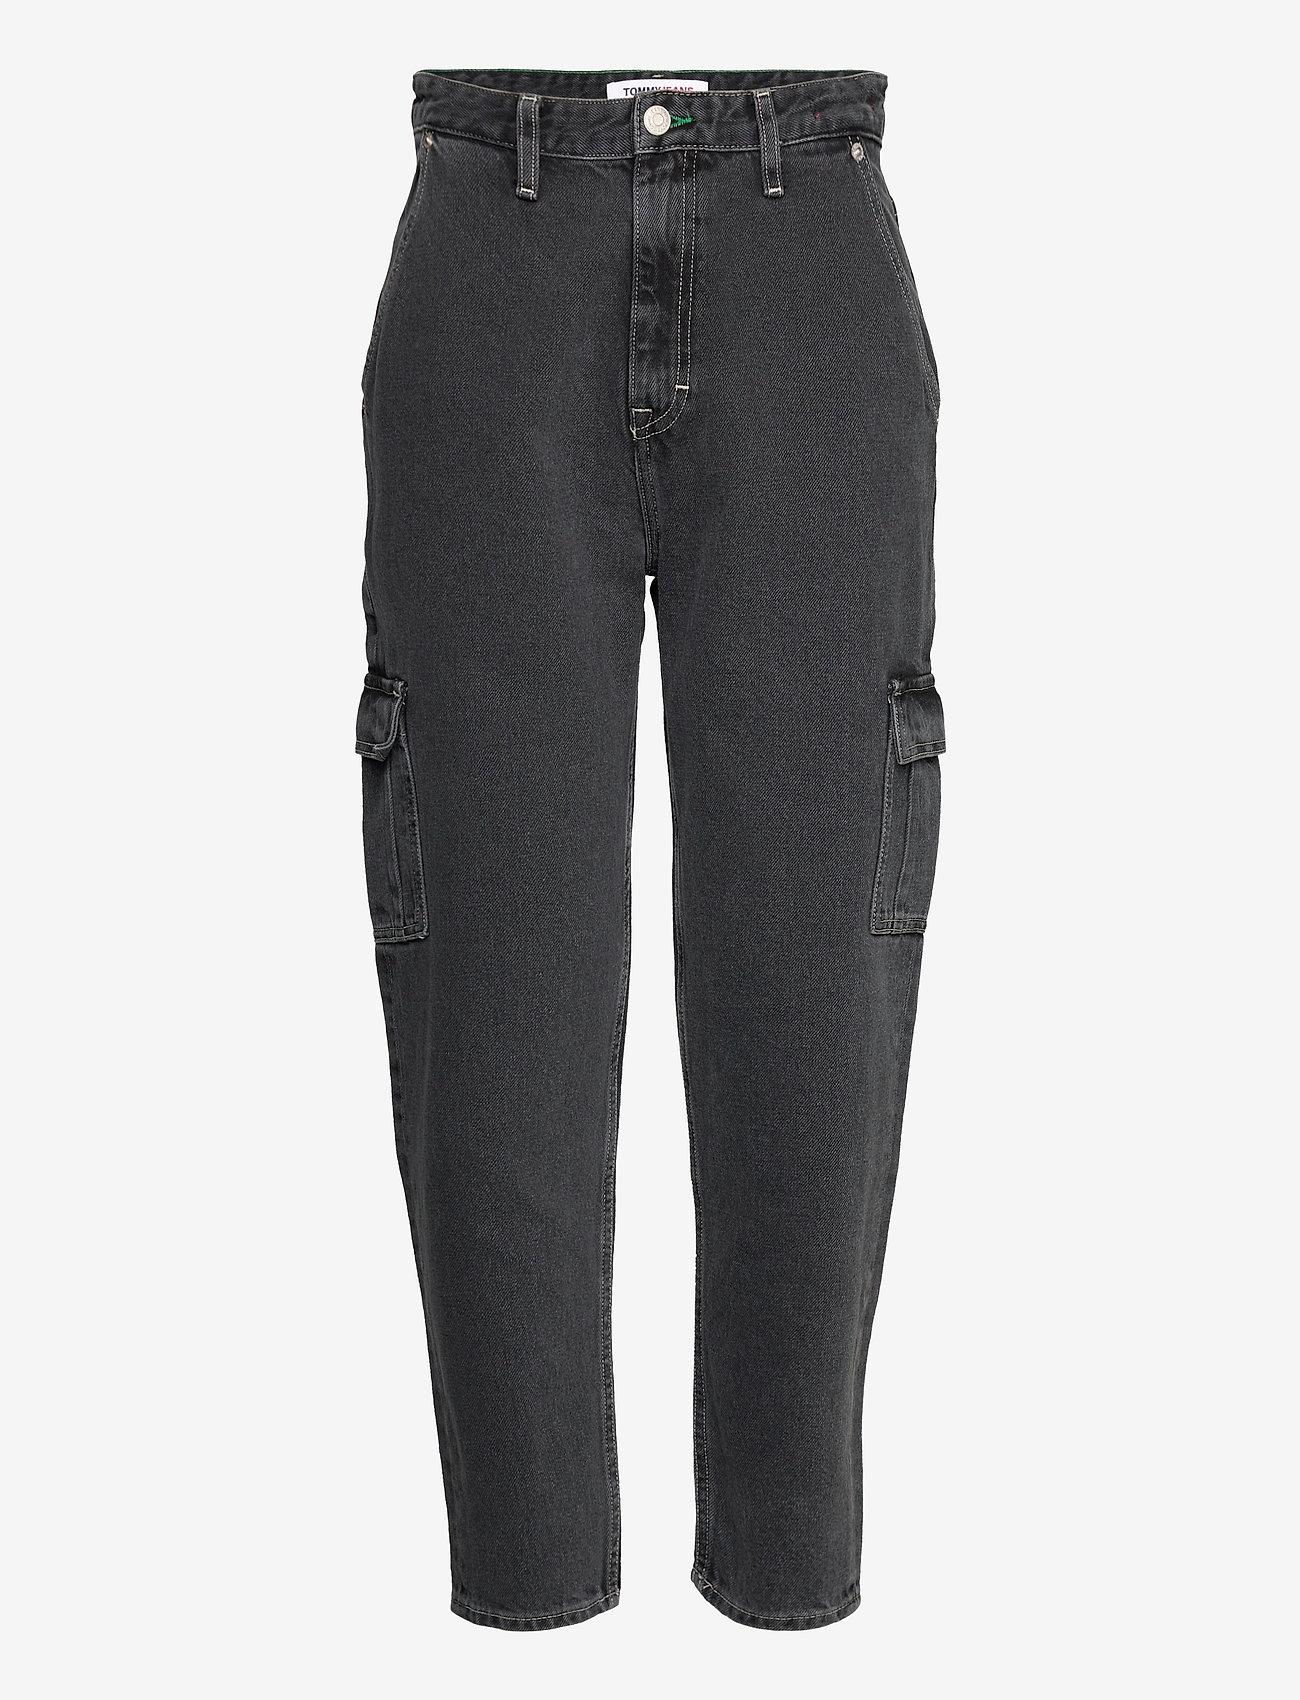 Tommy Jeans - MOM JEAN CARGO SVBKR - mom jeans - save ps bk rig - 0